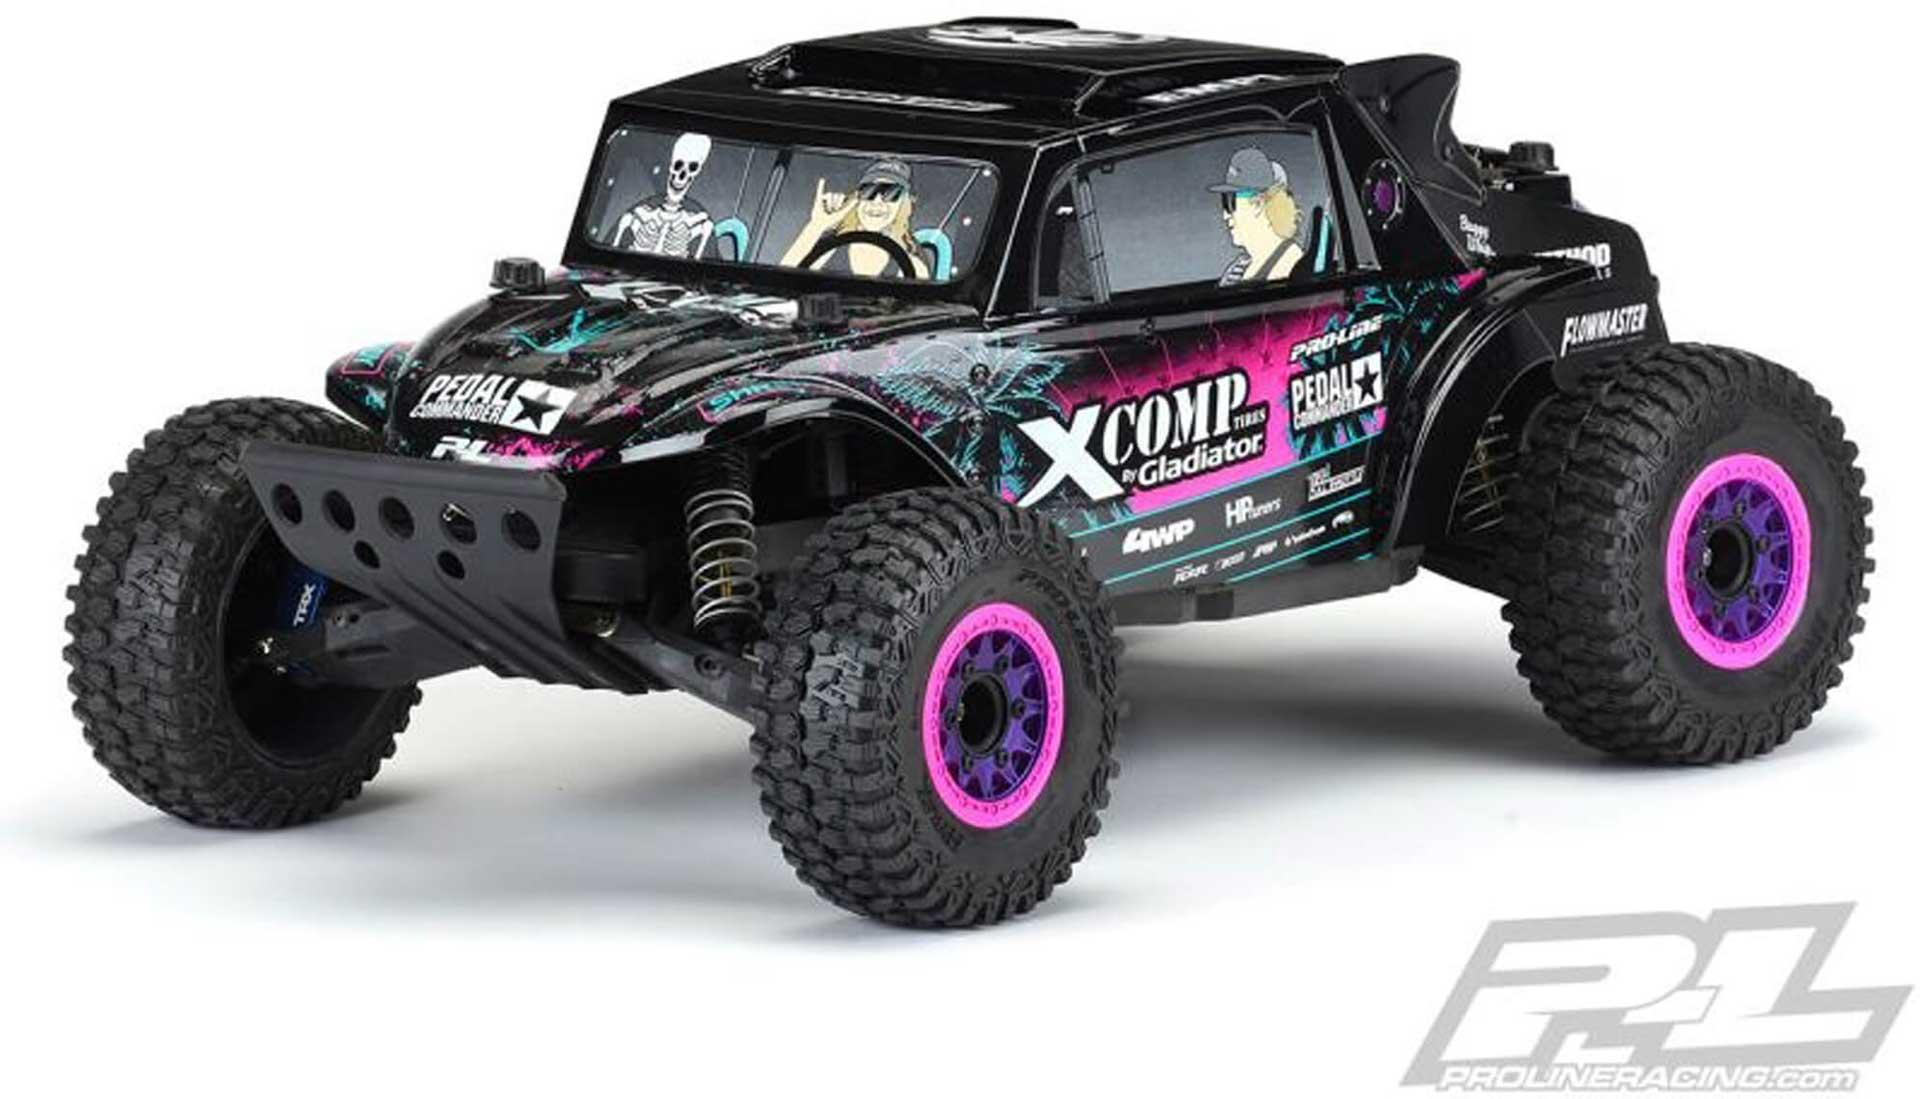 PROLINE Megalodon Desert Buggy Karosserie schwarz für Sl ash 2WD & 4X4 Blake Wilkey Edition Tough